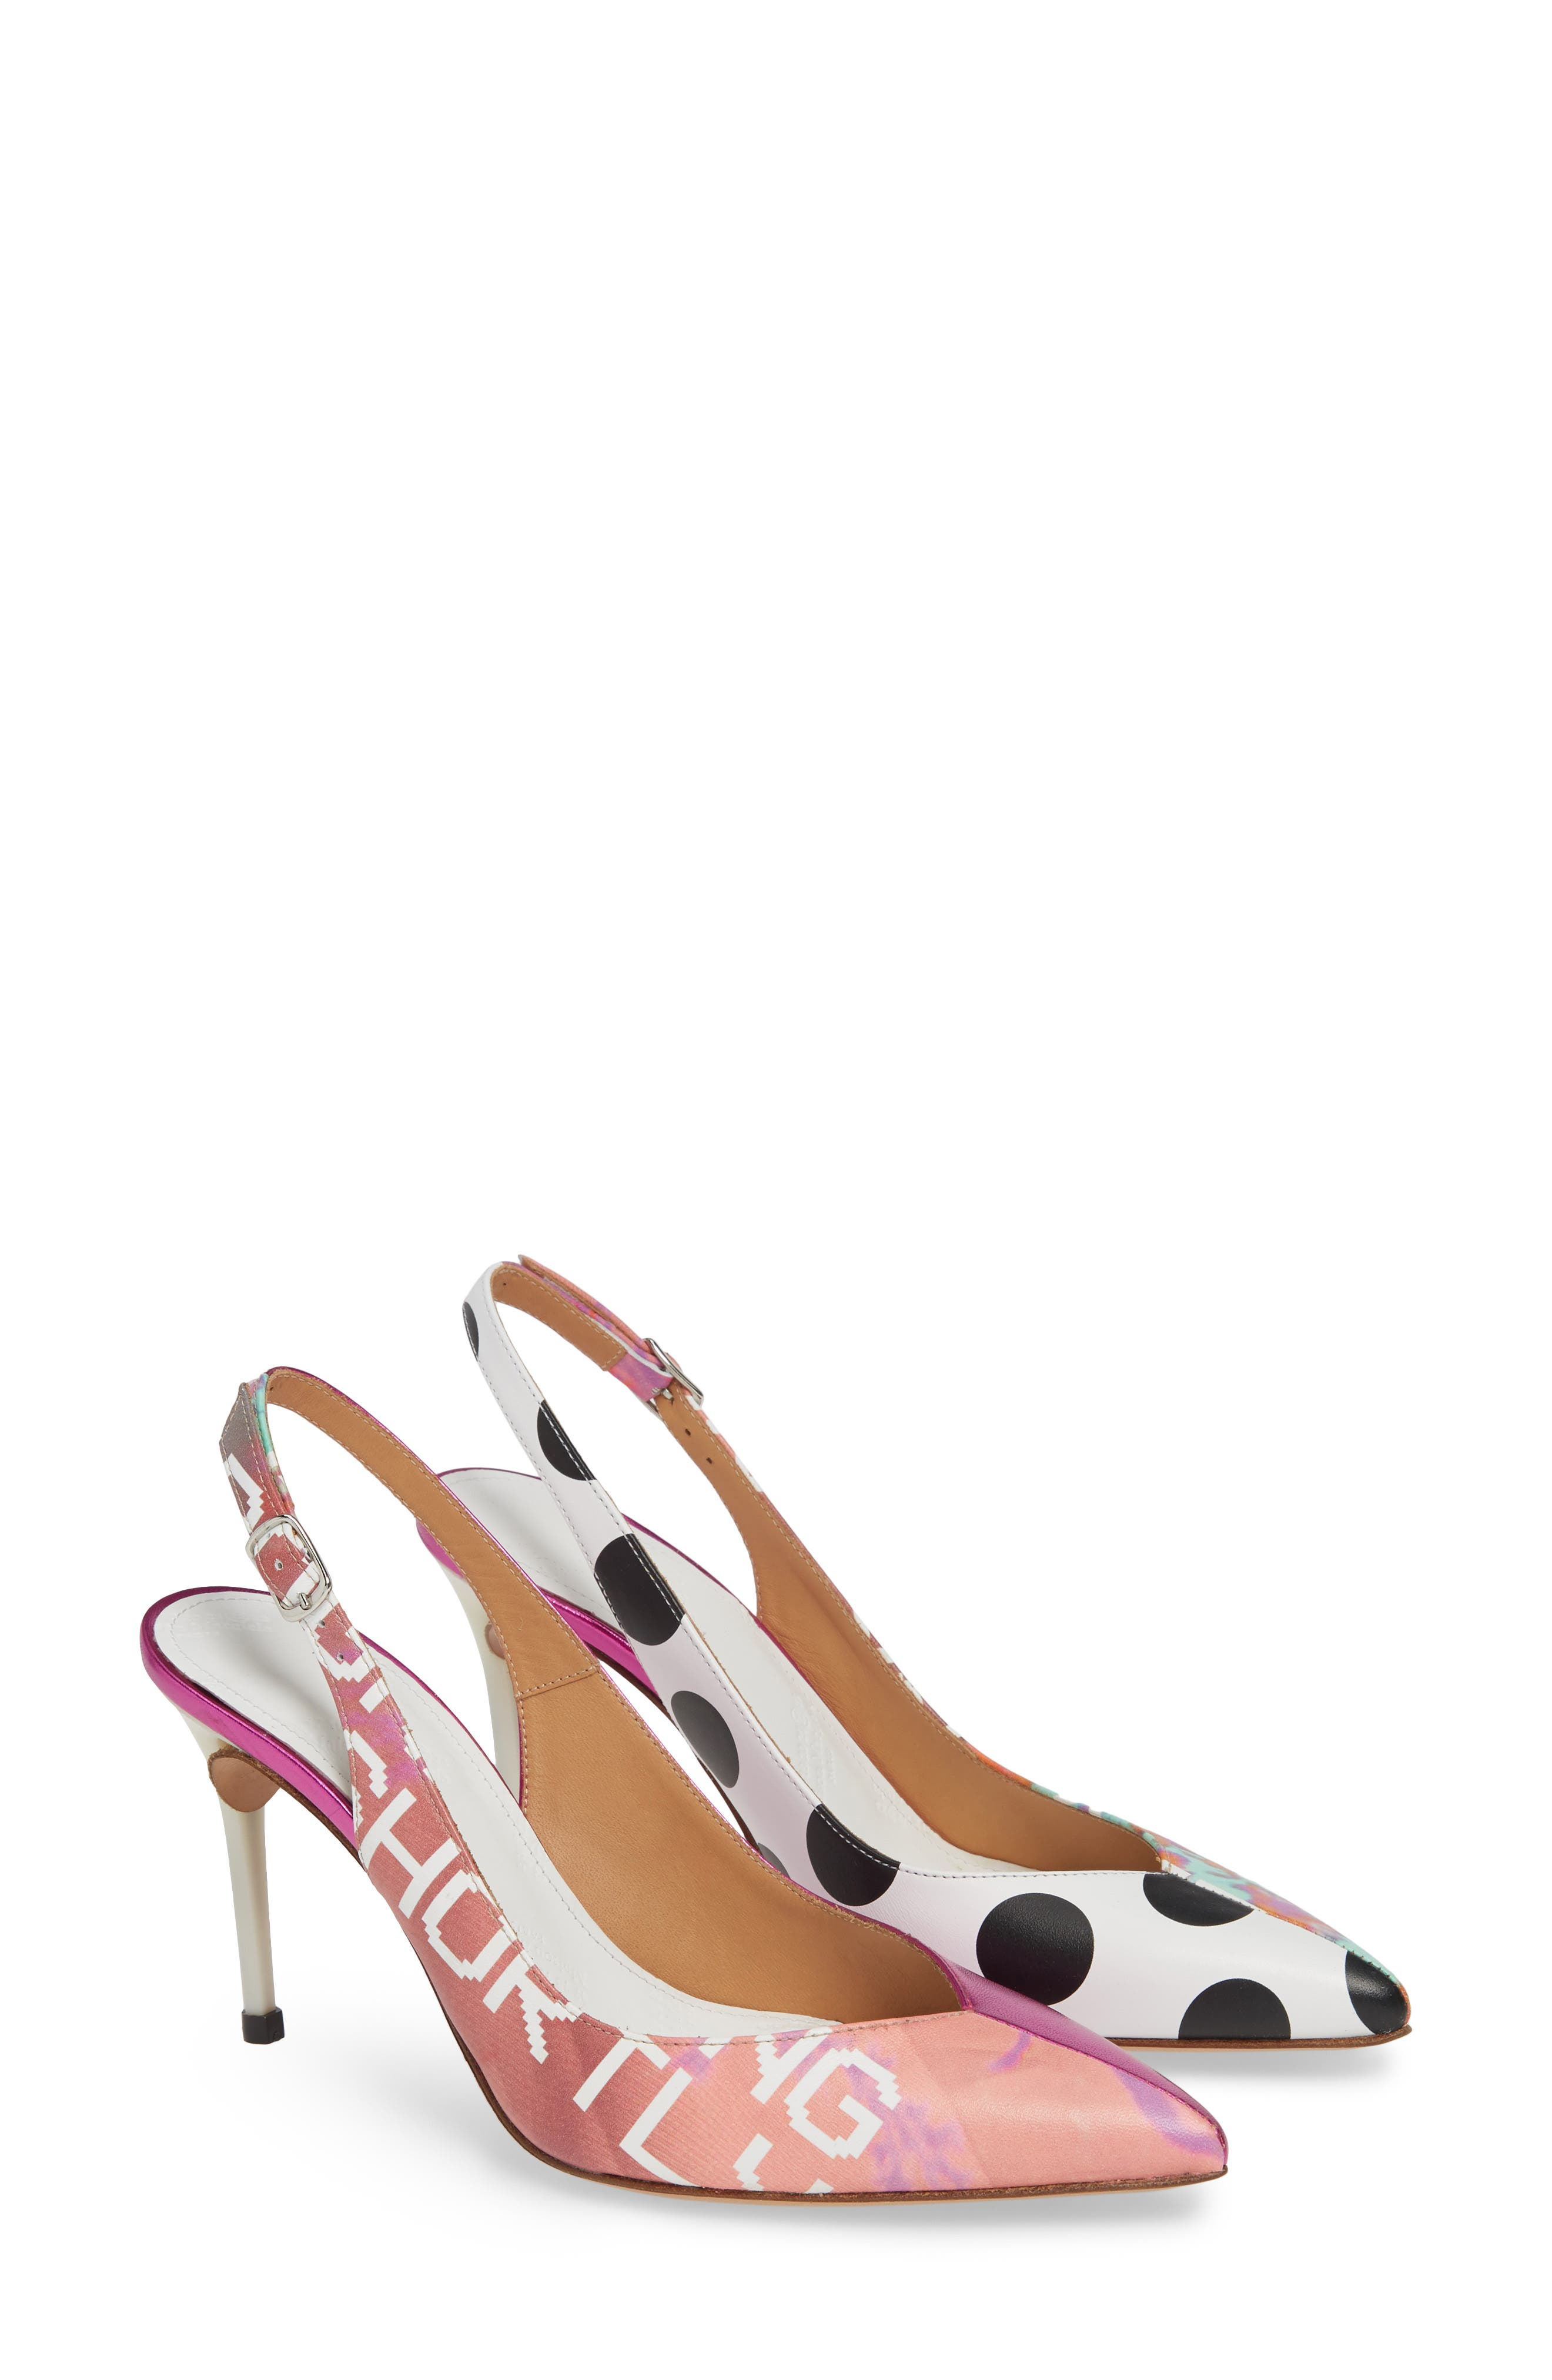 c82c9208d Women's Designer Shoes | Nordstrom